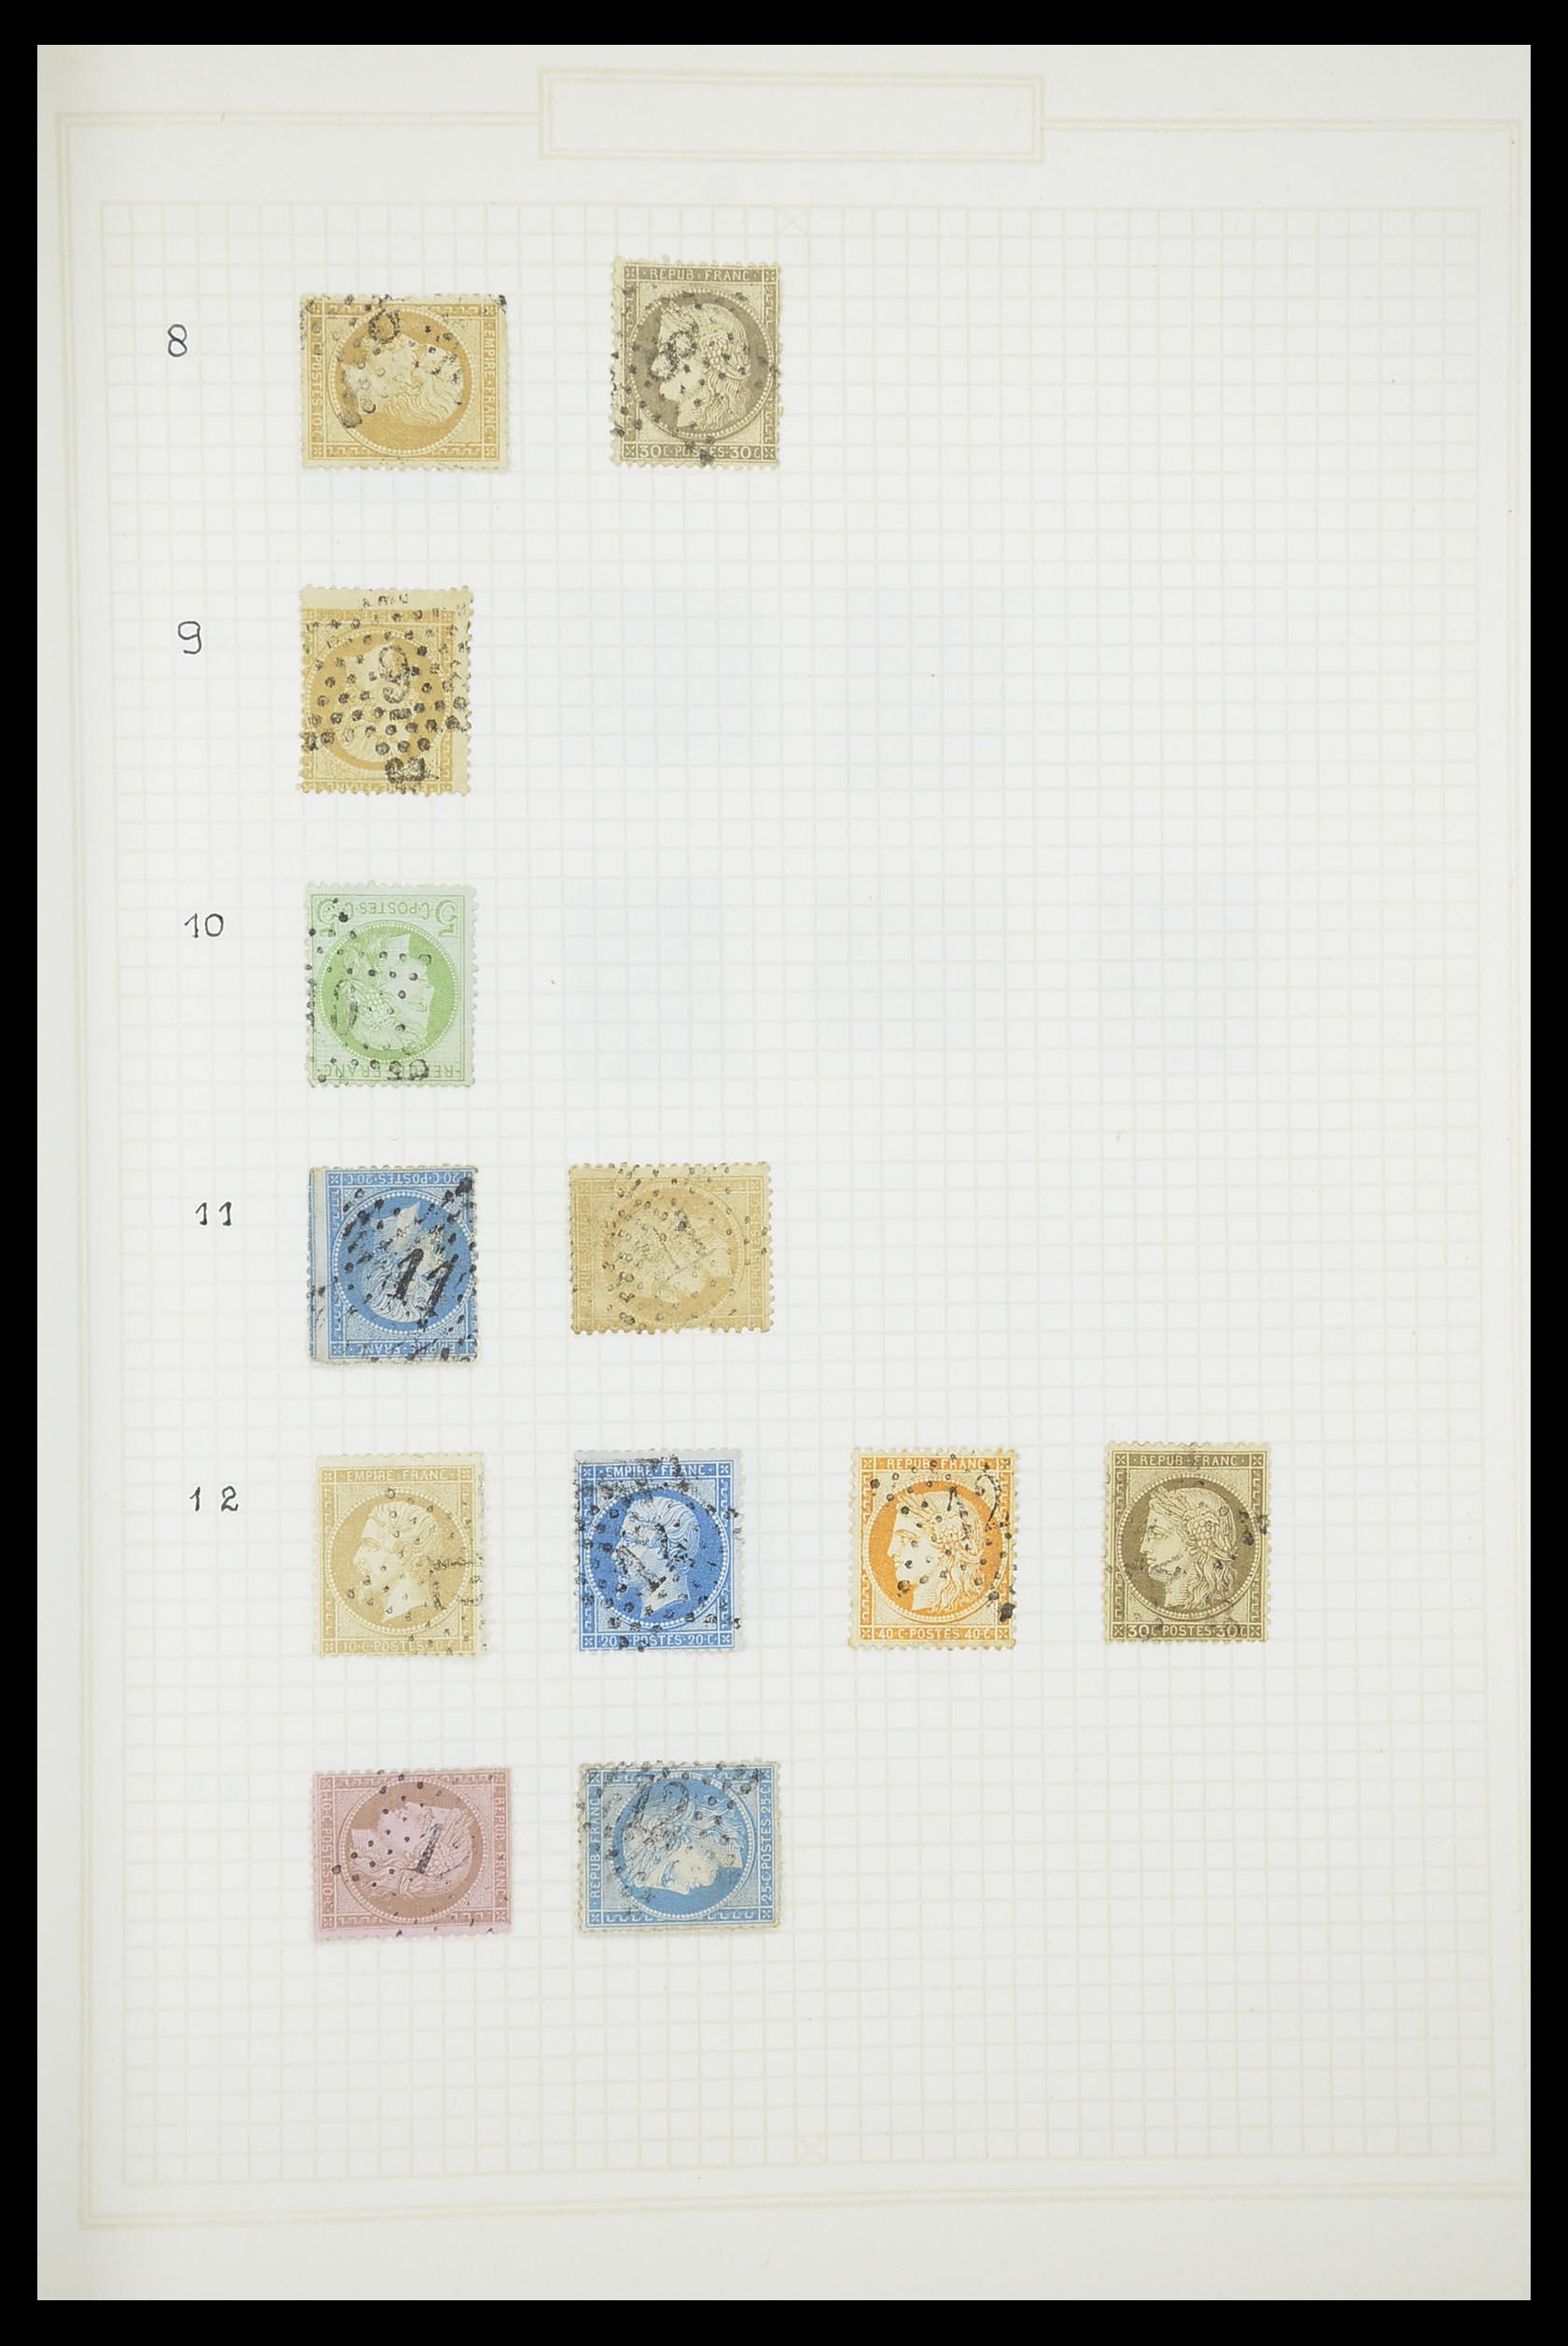 33851 003 - Postzegelverzameling 33851 Frankrijk klassiek stempels.